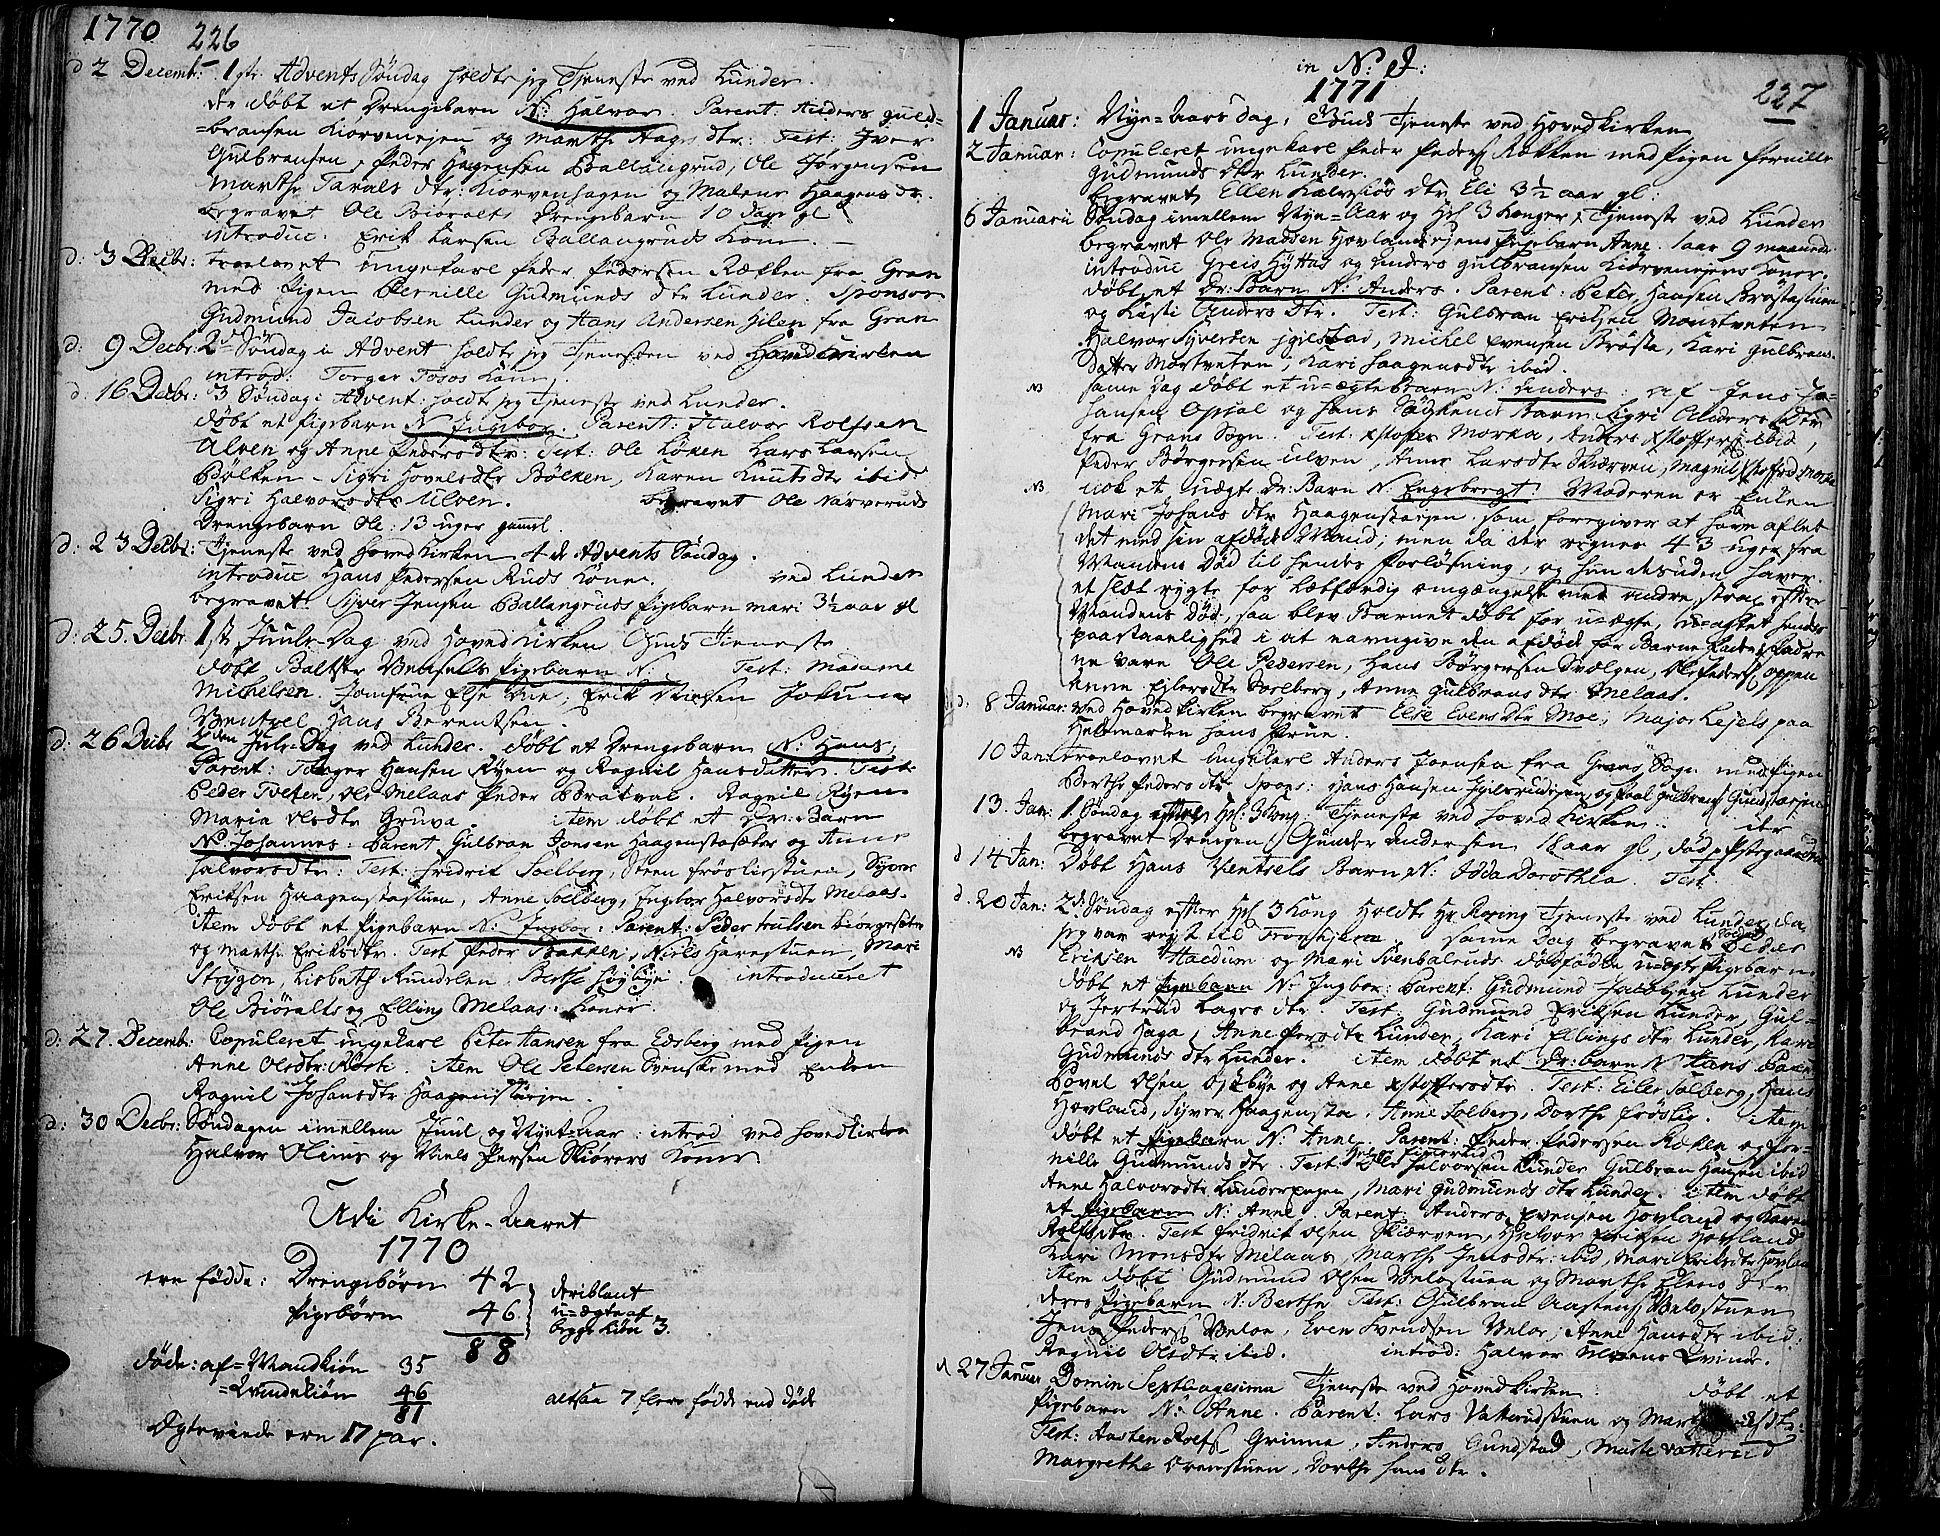 SAH, Jevnaker prestekontor, Ministerialbok nr. 3, 1752-1799, s. 226-227